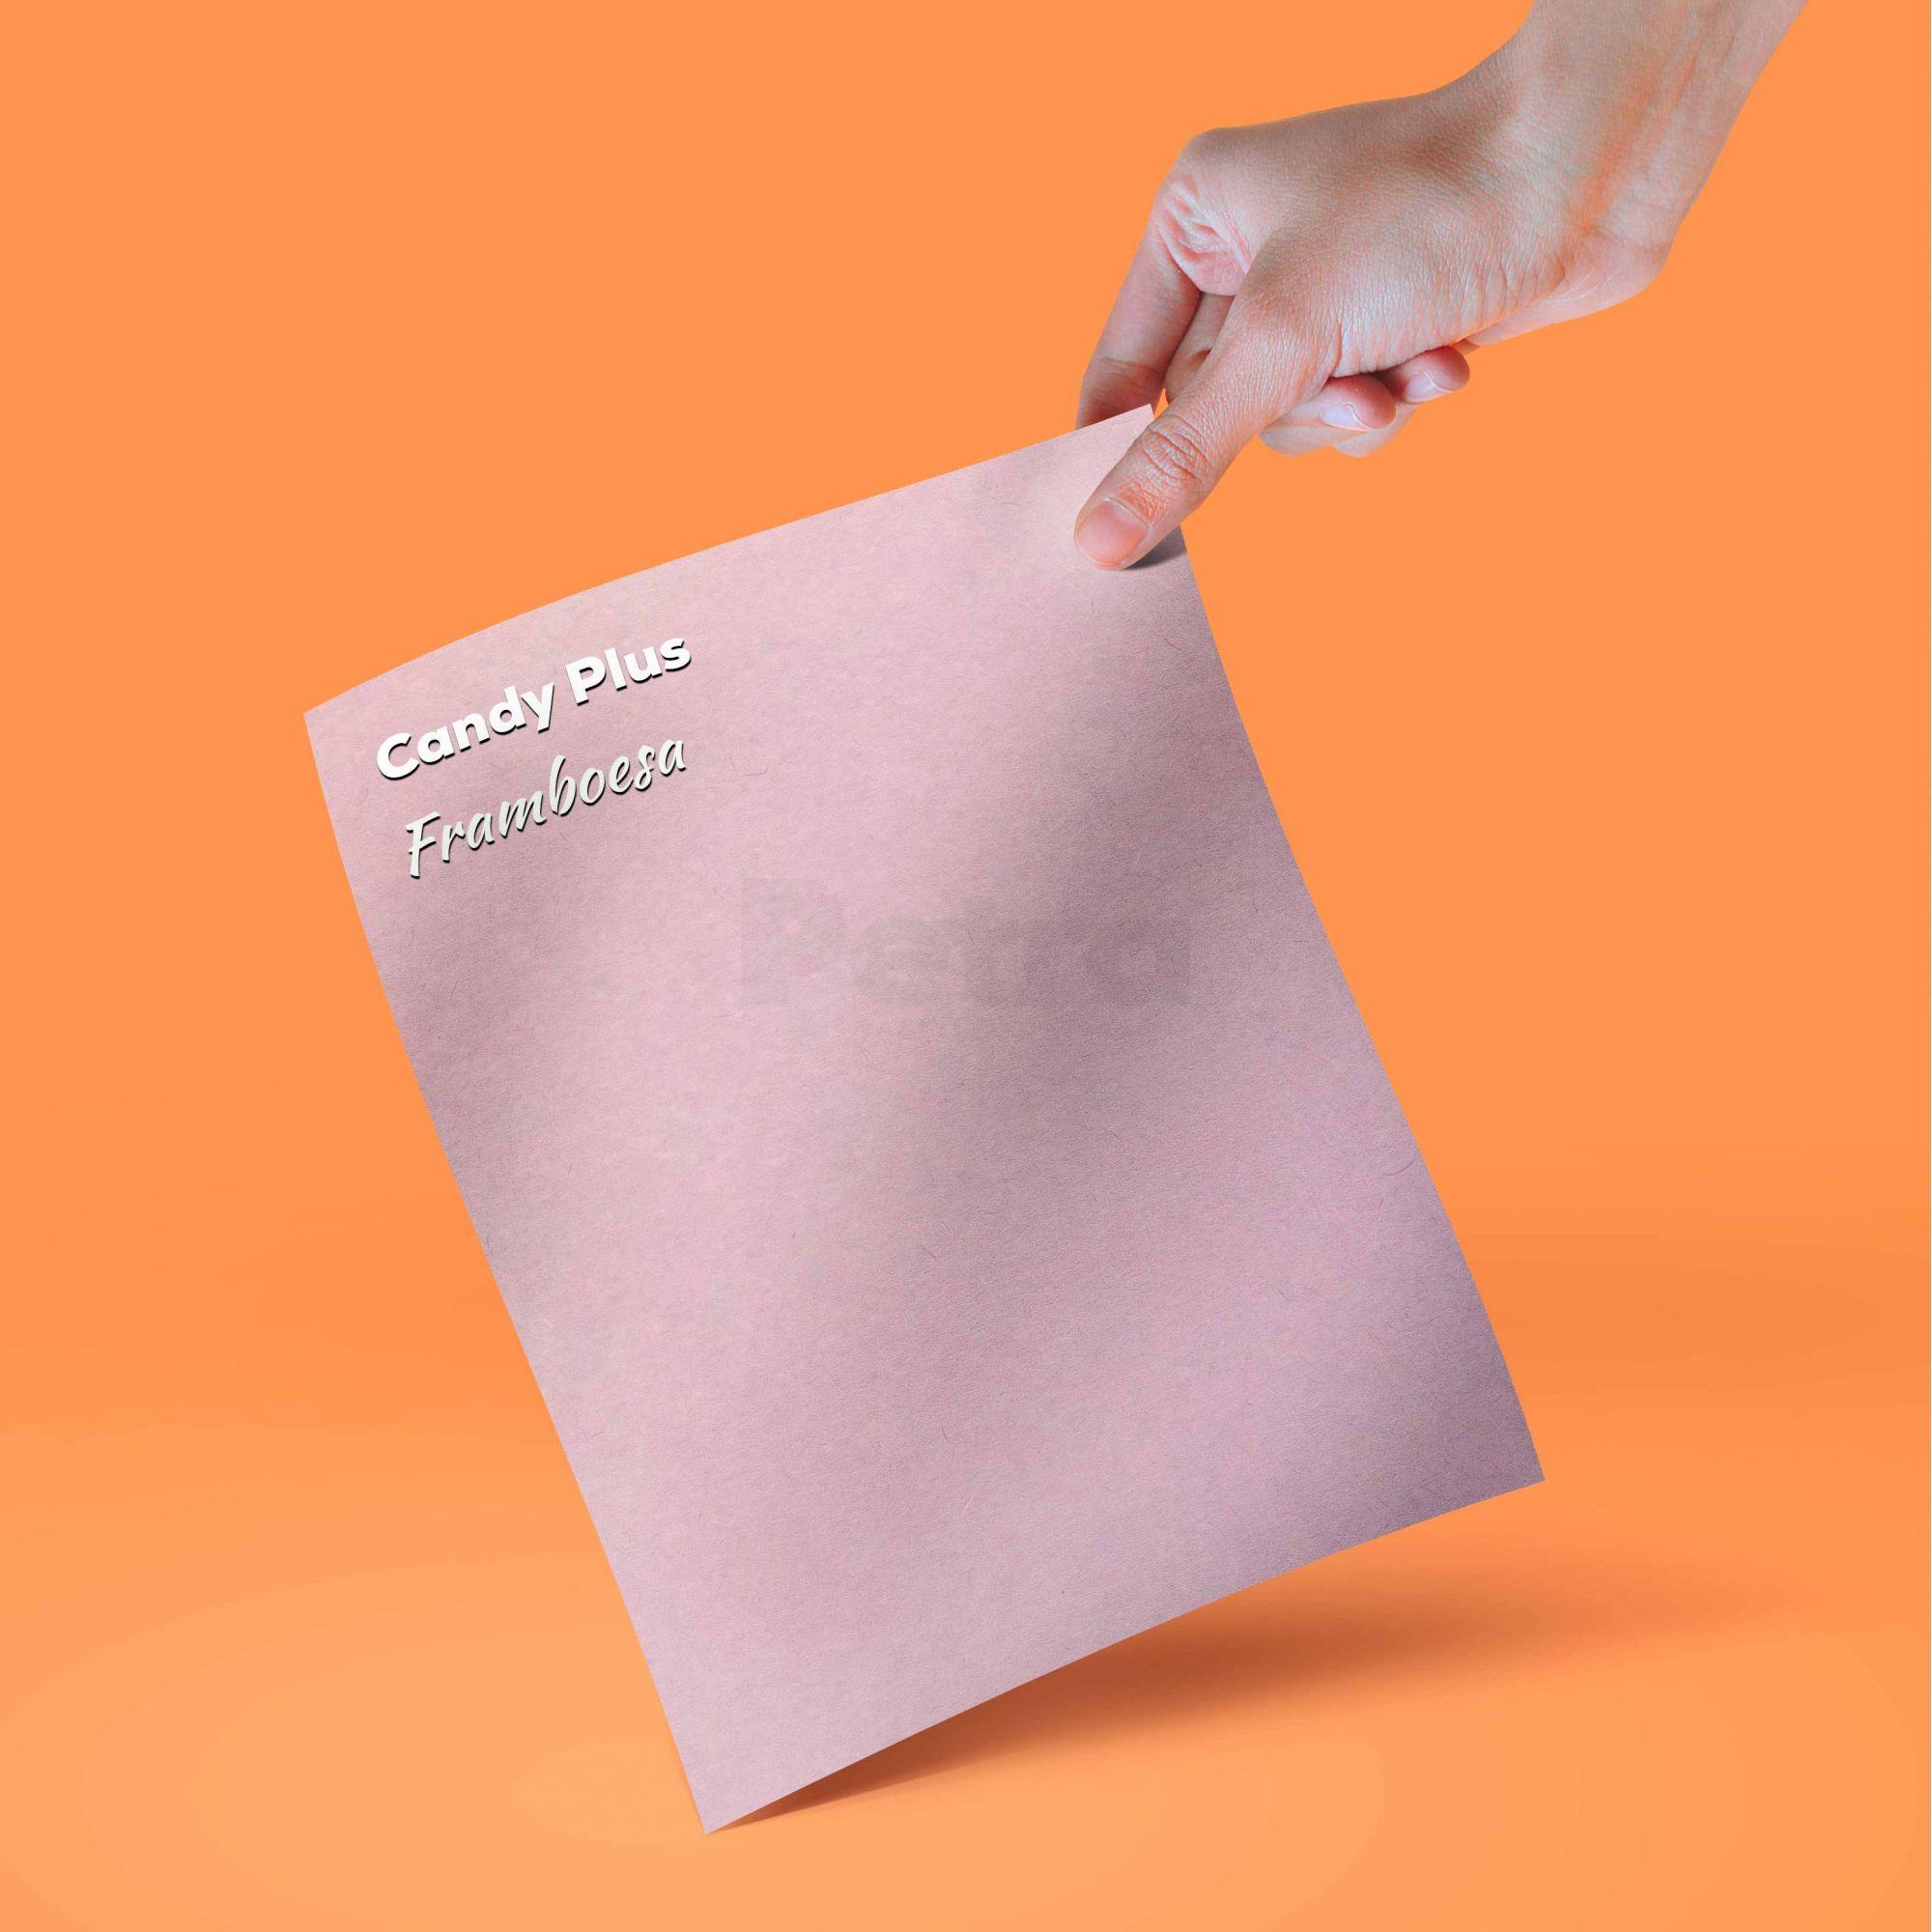 Candy Plus - Framboesa - Lilas  - Tam. A3 - 180g/m² - 20 folhas